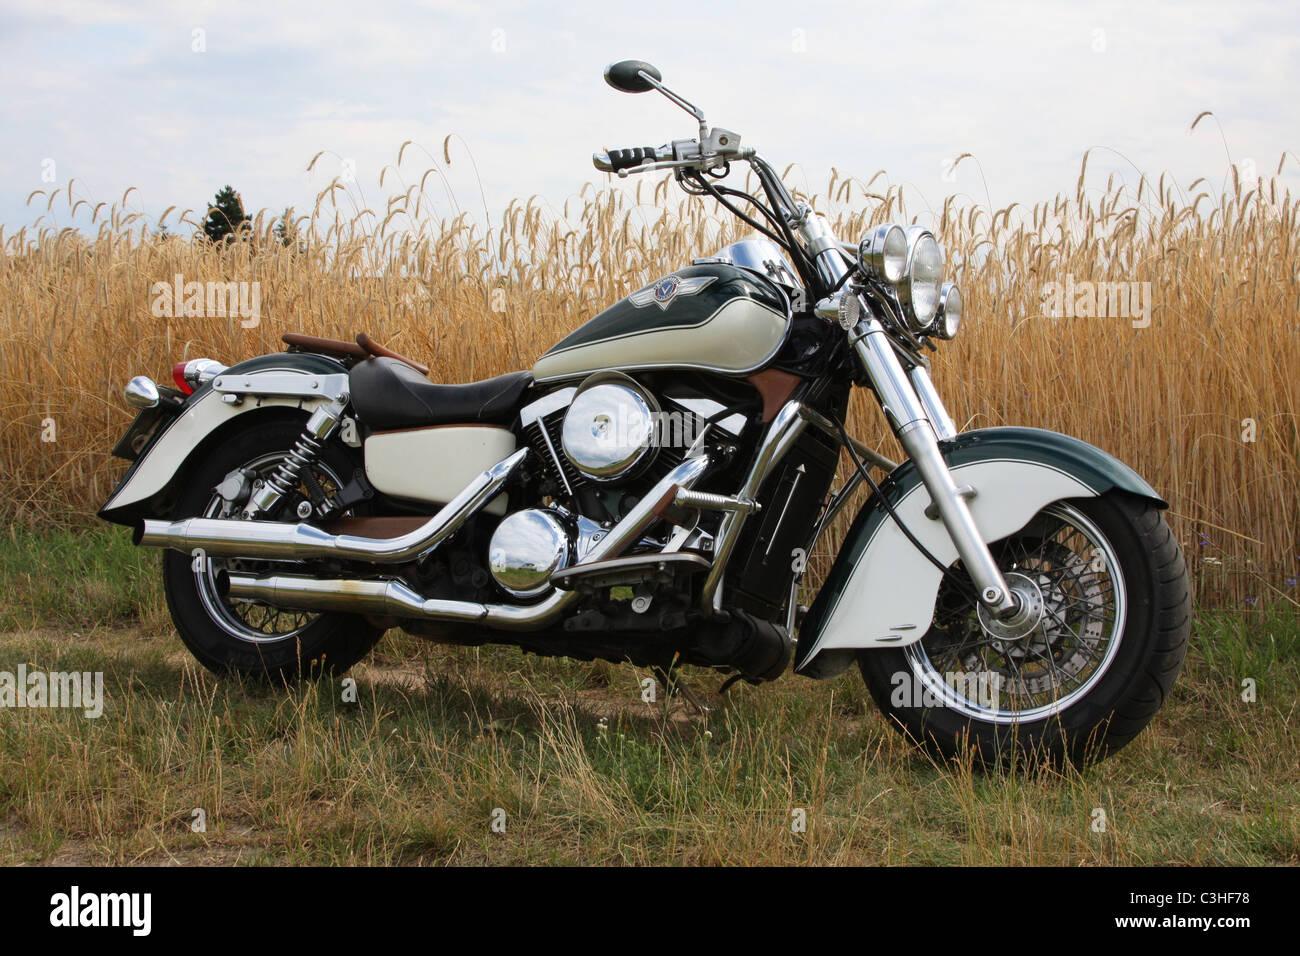 Motorrad, Kawasaki, im Kornfeld, Seitenansicht, Motorcycle, Motorbike, in cornfield, side view - Stock Image